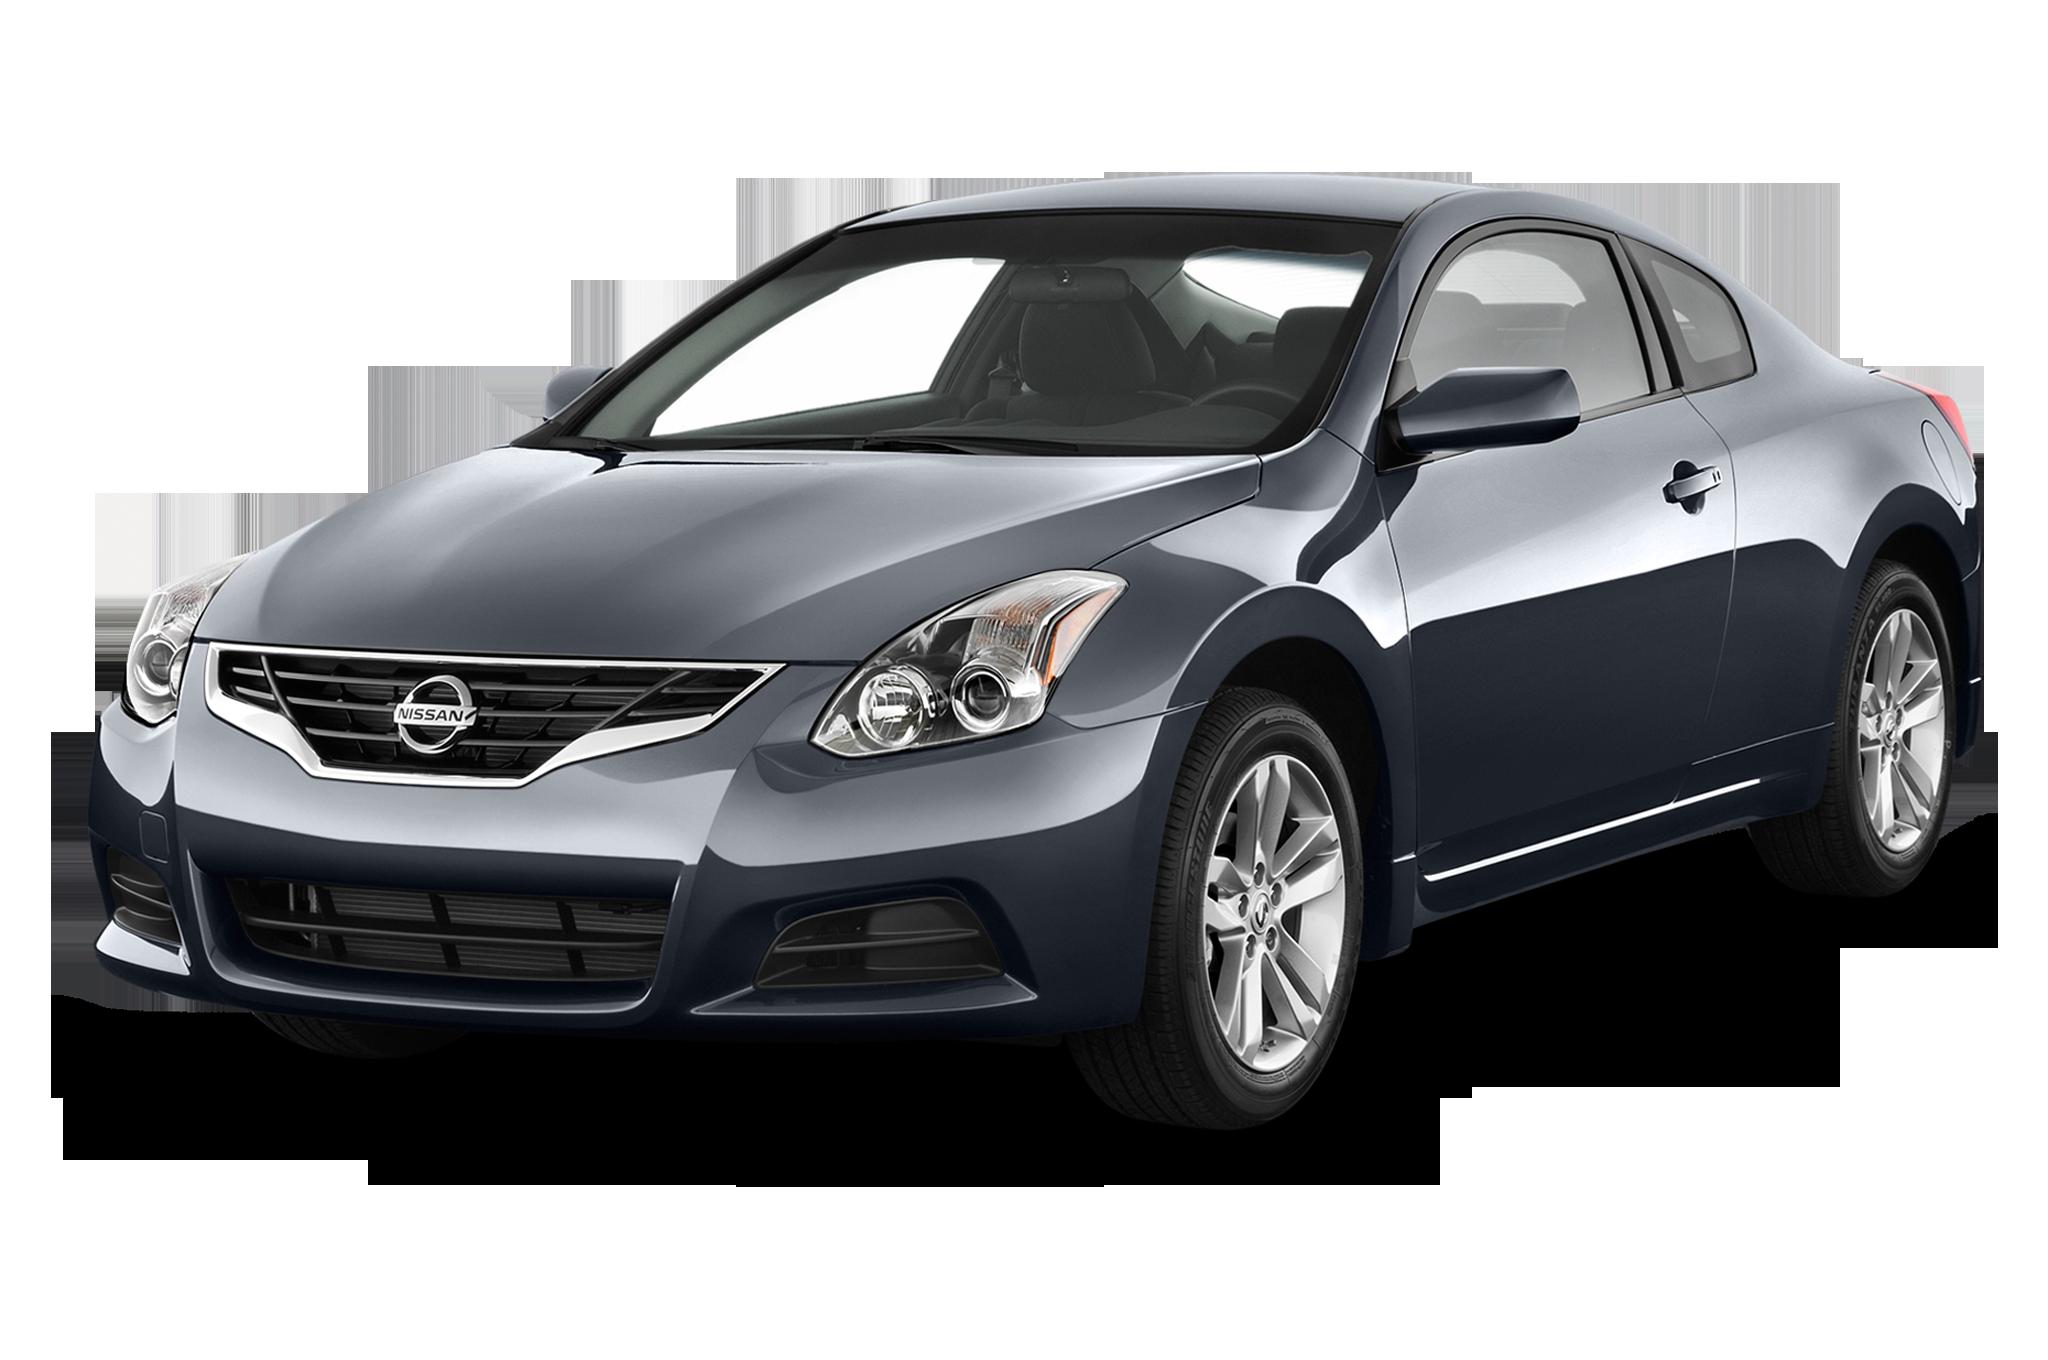 2010 Nissan Altima 2.5 S Coupe >> 2010 Nissan Altima Coupe 3.5 SR - Driven - Automobile Magazine